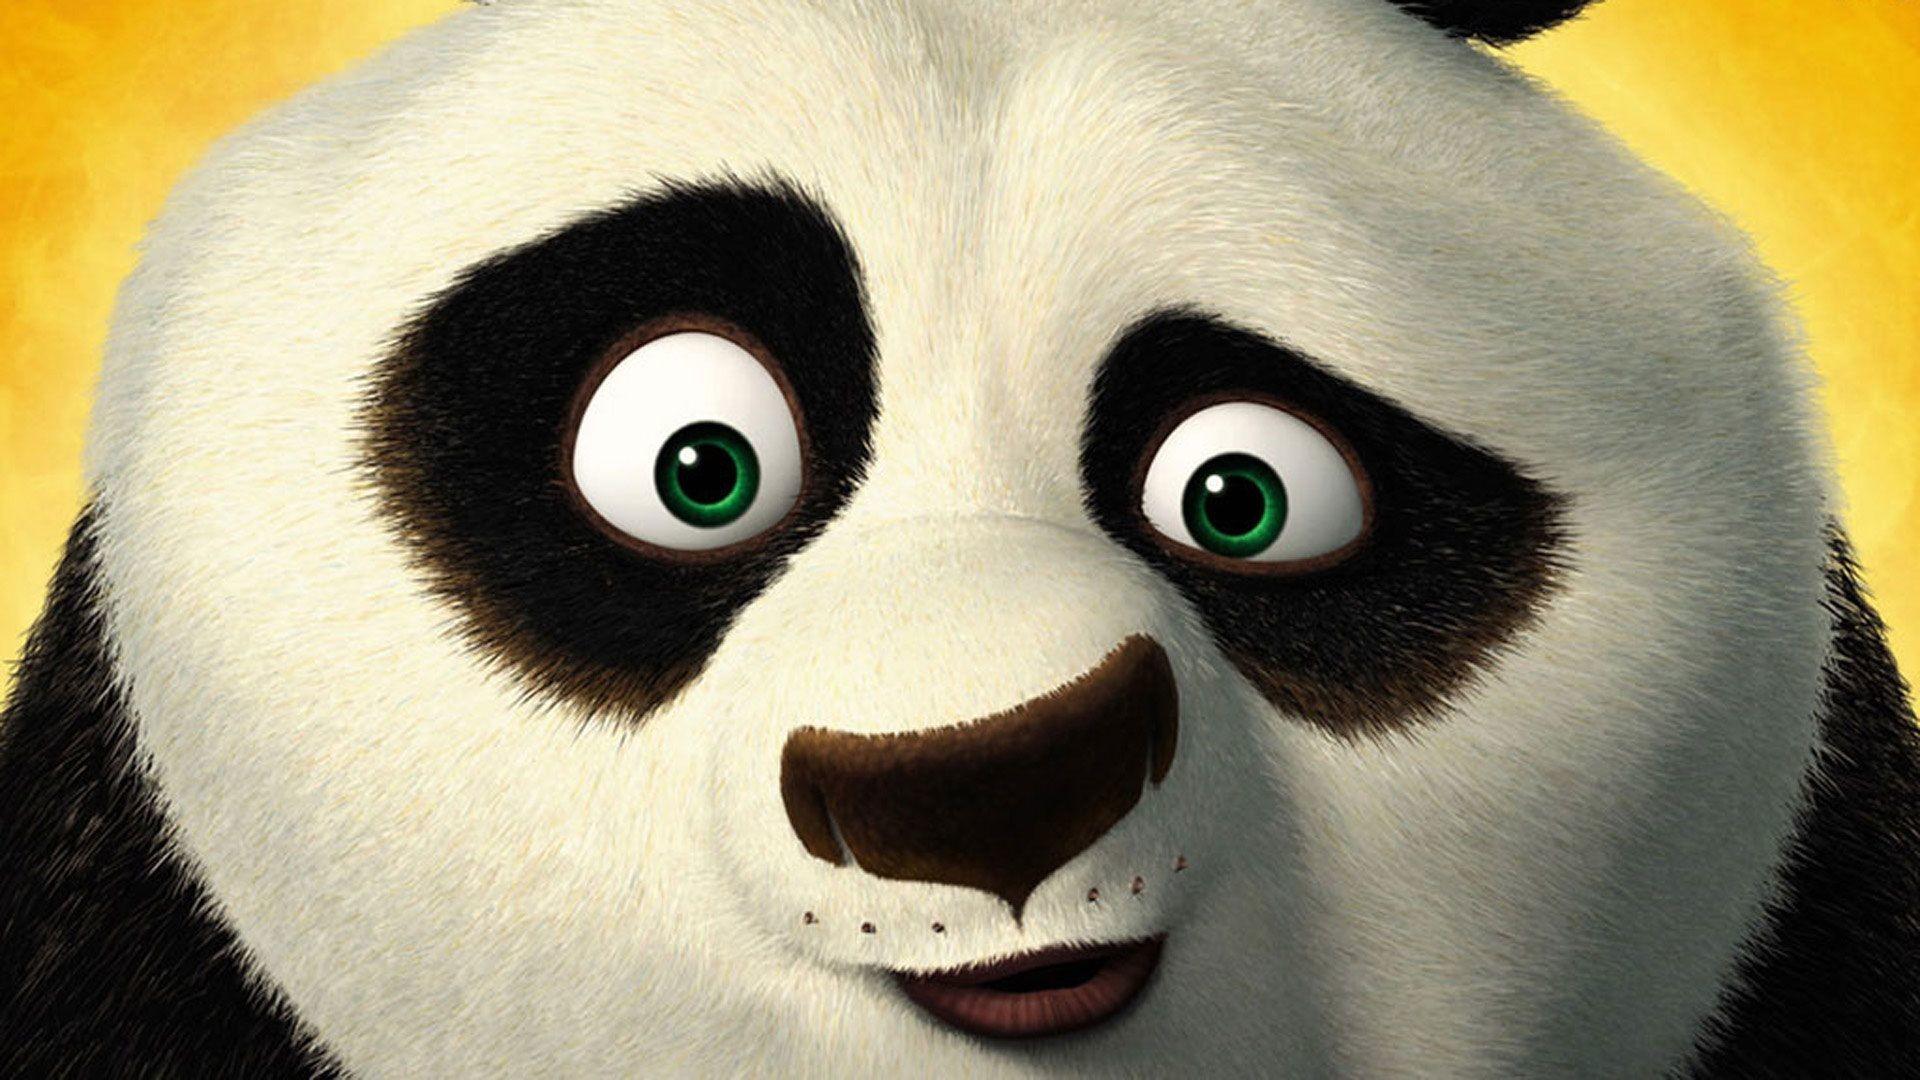 Res: 1920x1080, hd pics photos cartoon panda kungfu desktop background wallpaper